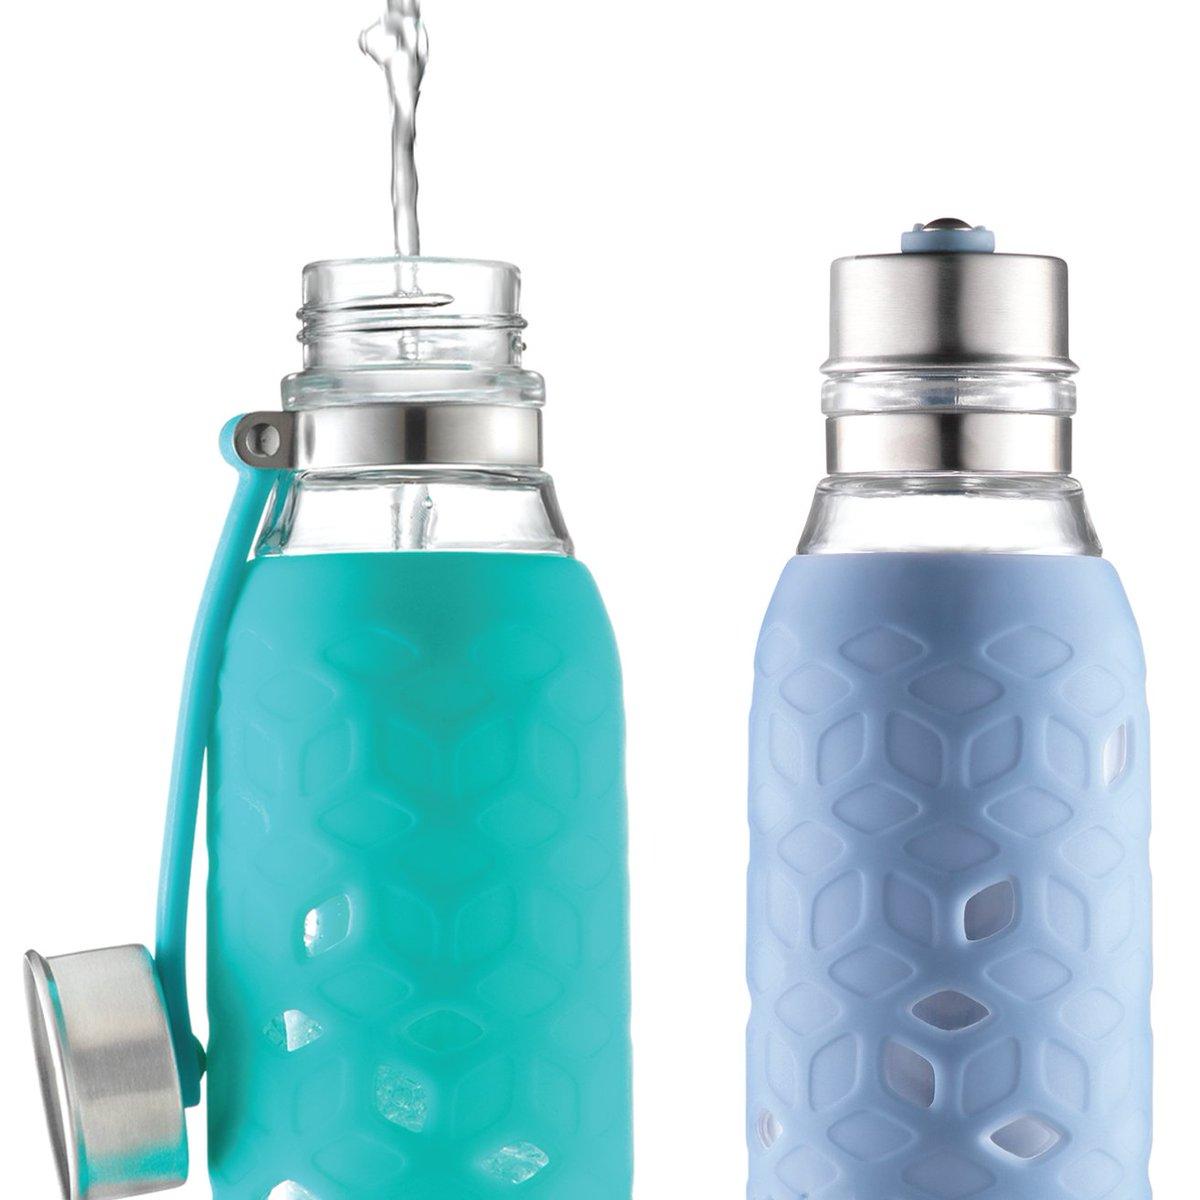 Happy Earth Day! We're challenging you to choose to reuse - one water bottle at a time. #GoContigo #Contigo https://t.co/k8HhgCdP6o